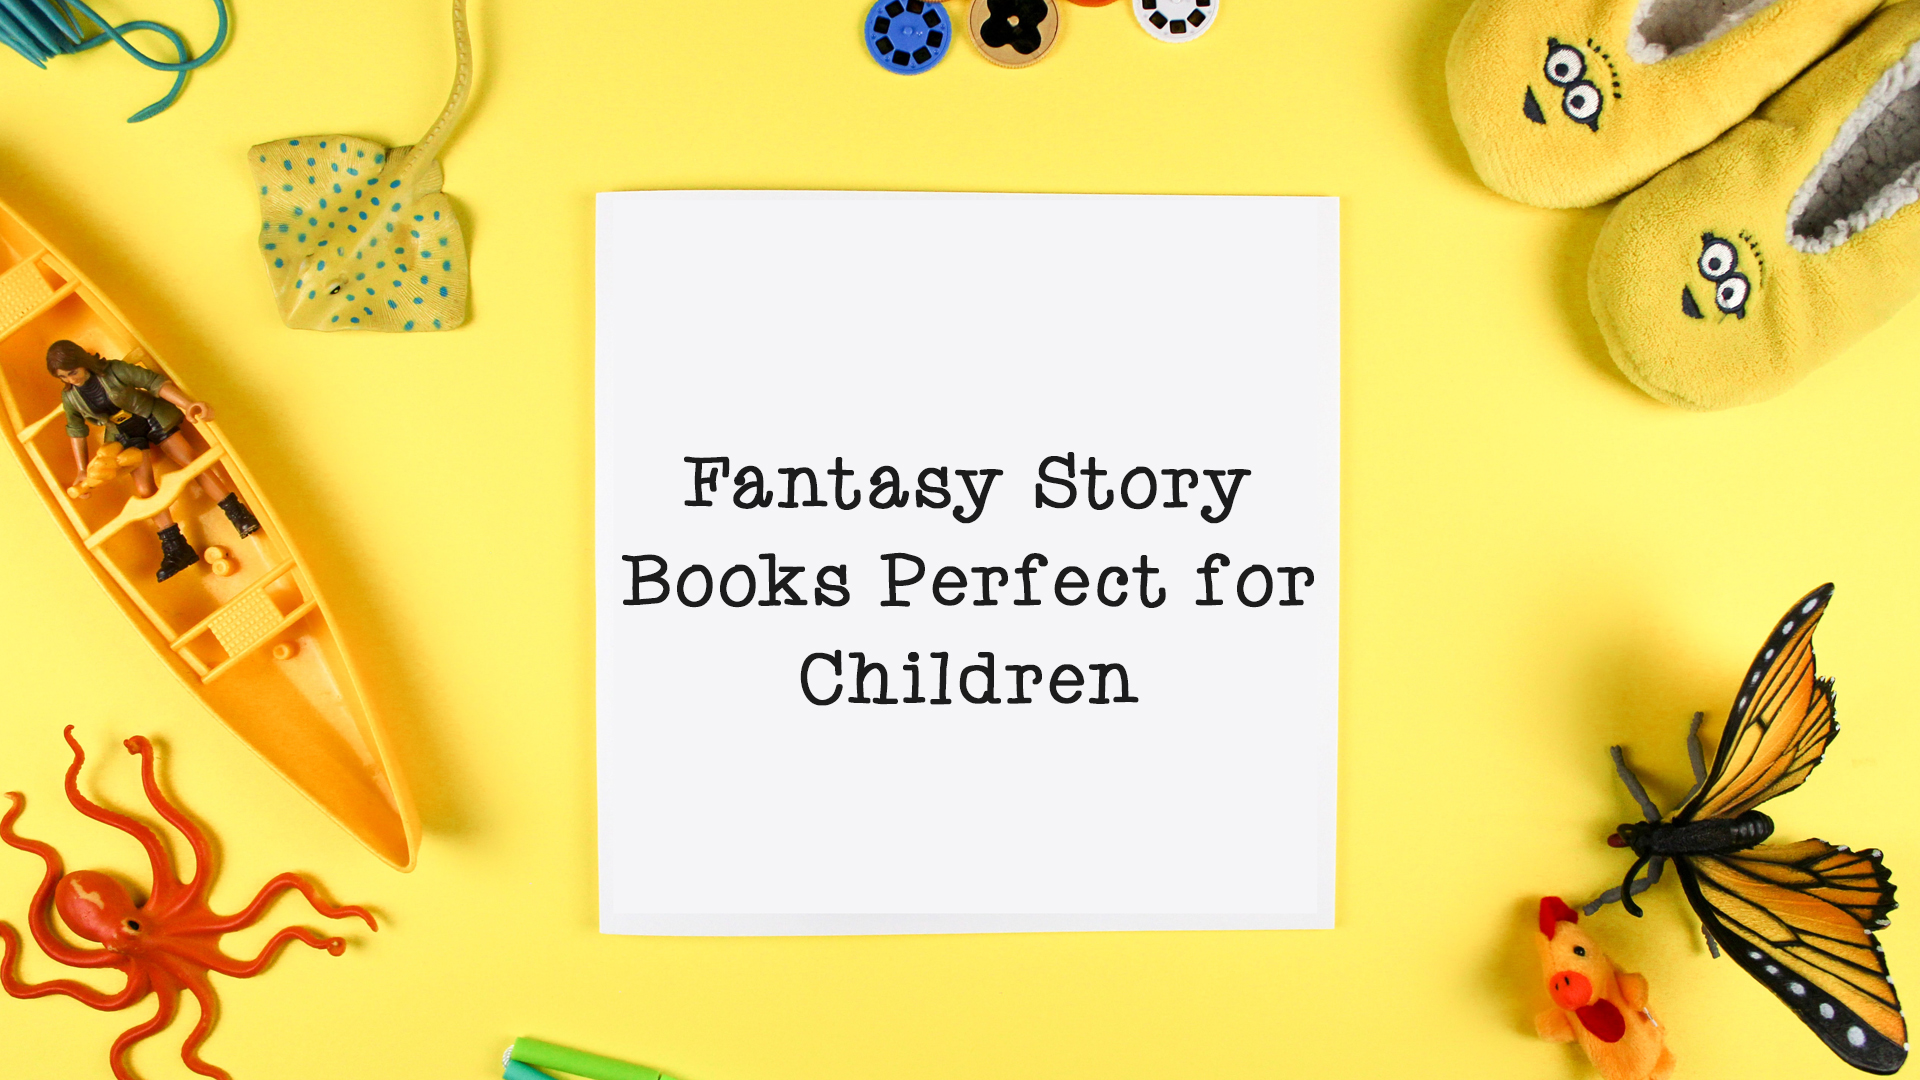 Fantasy Story Books Perfect for Children banner